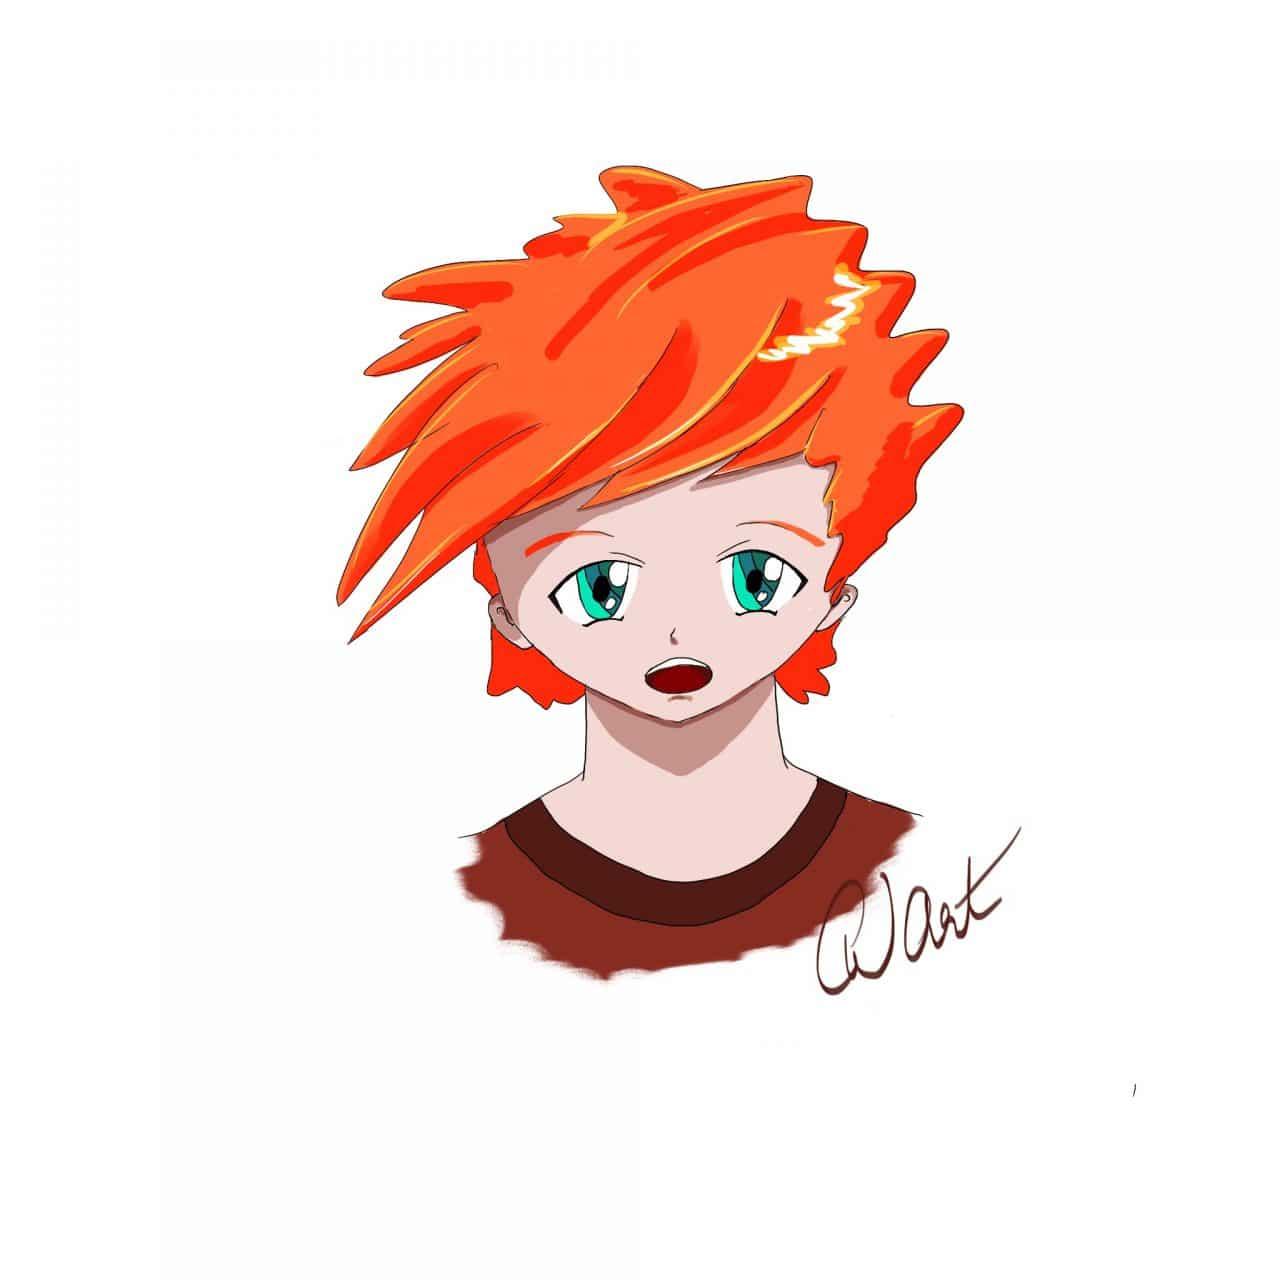 redhead, manga